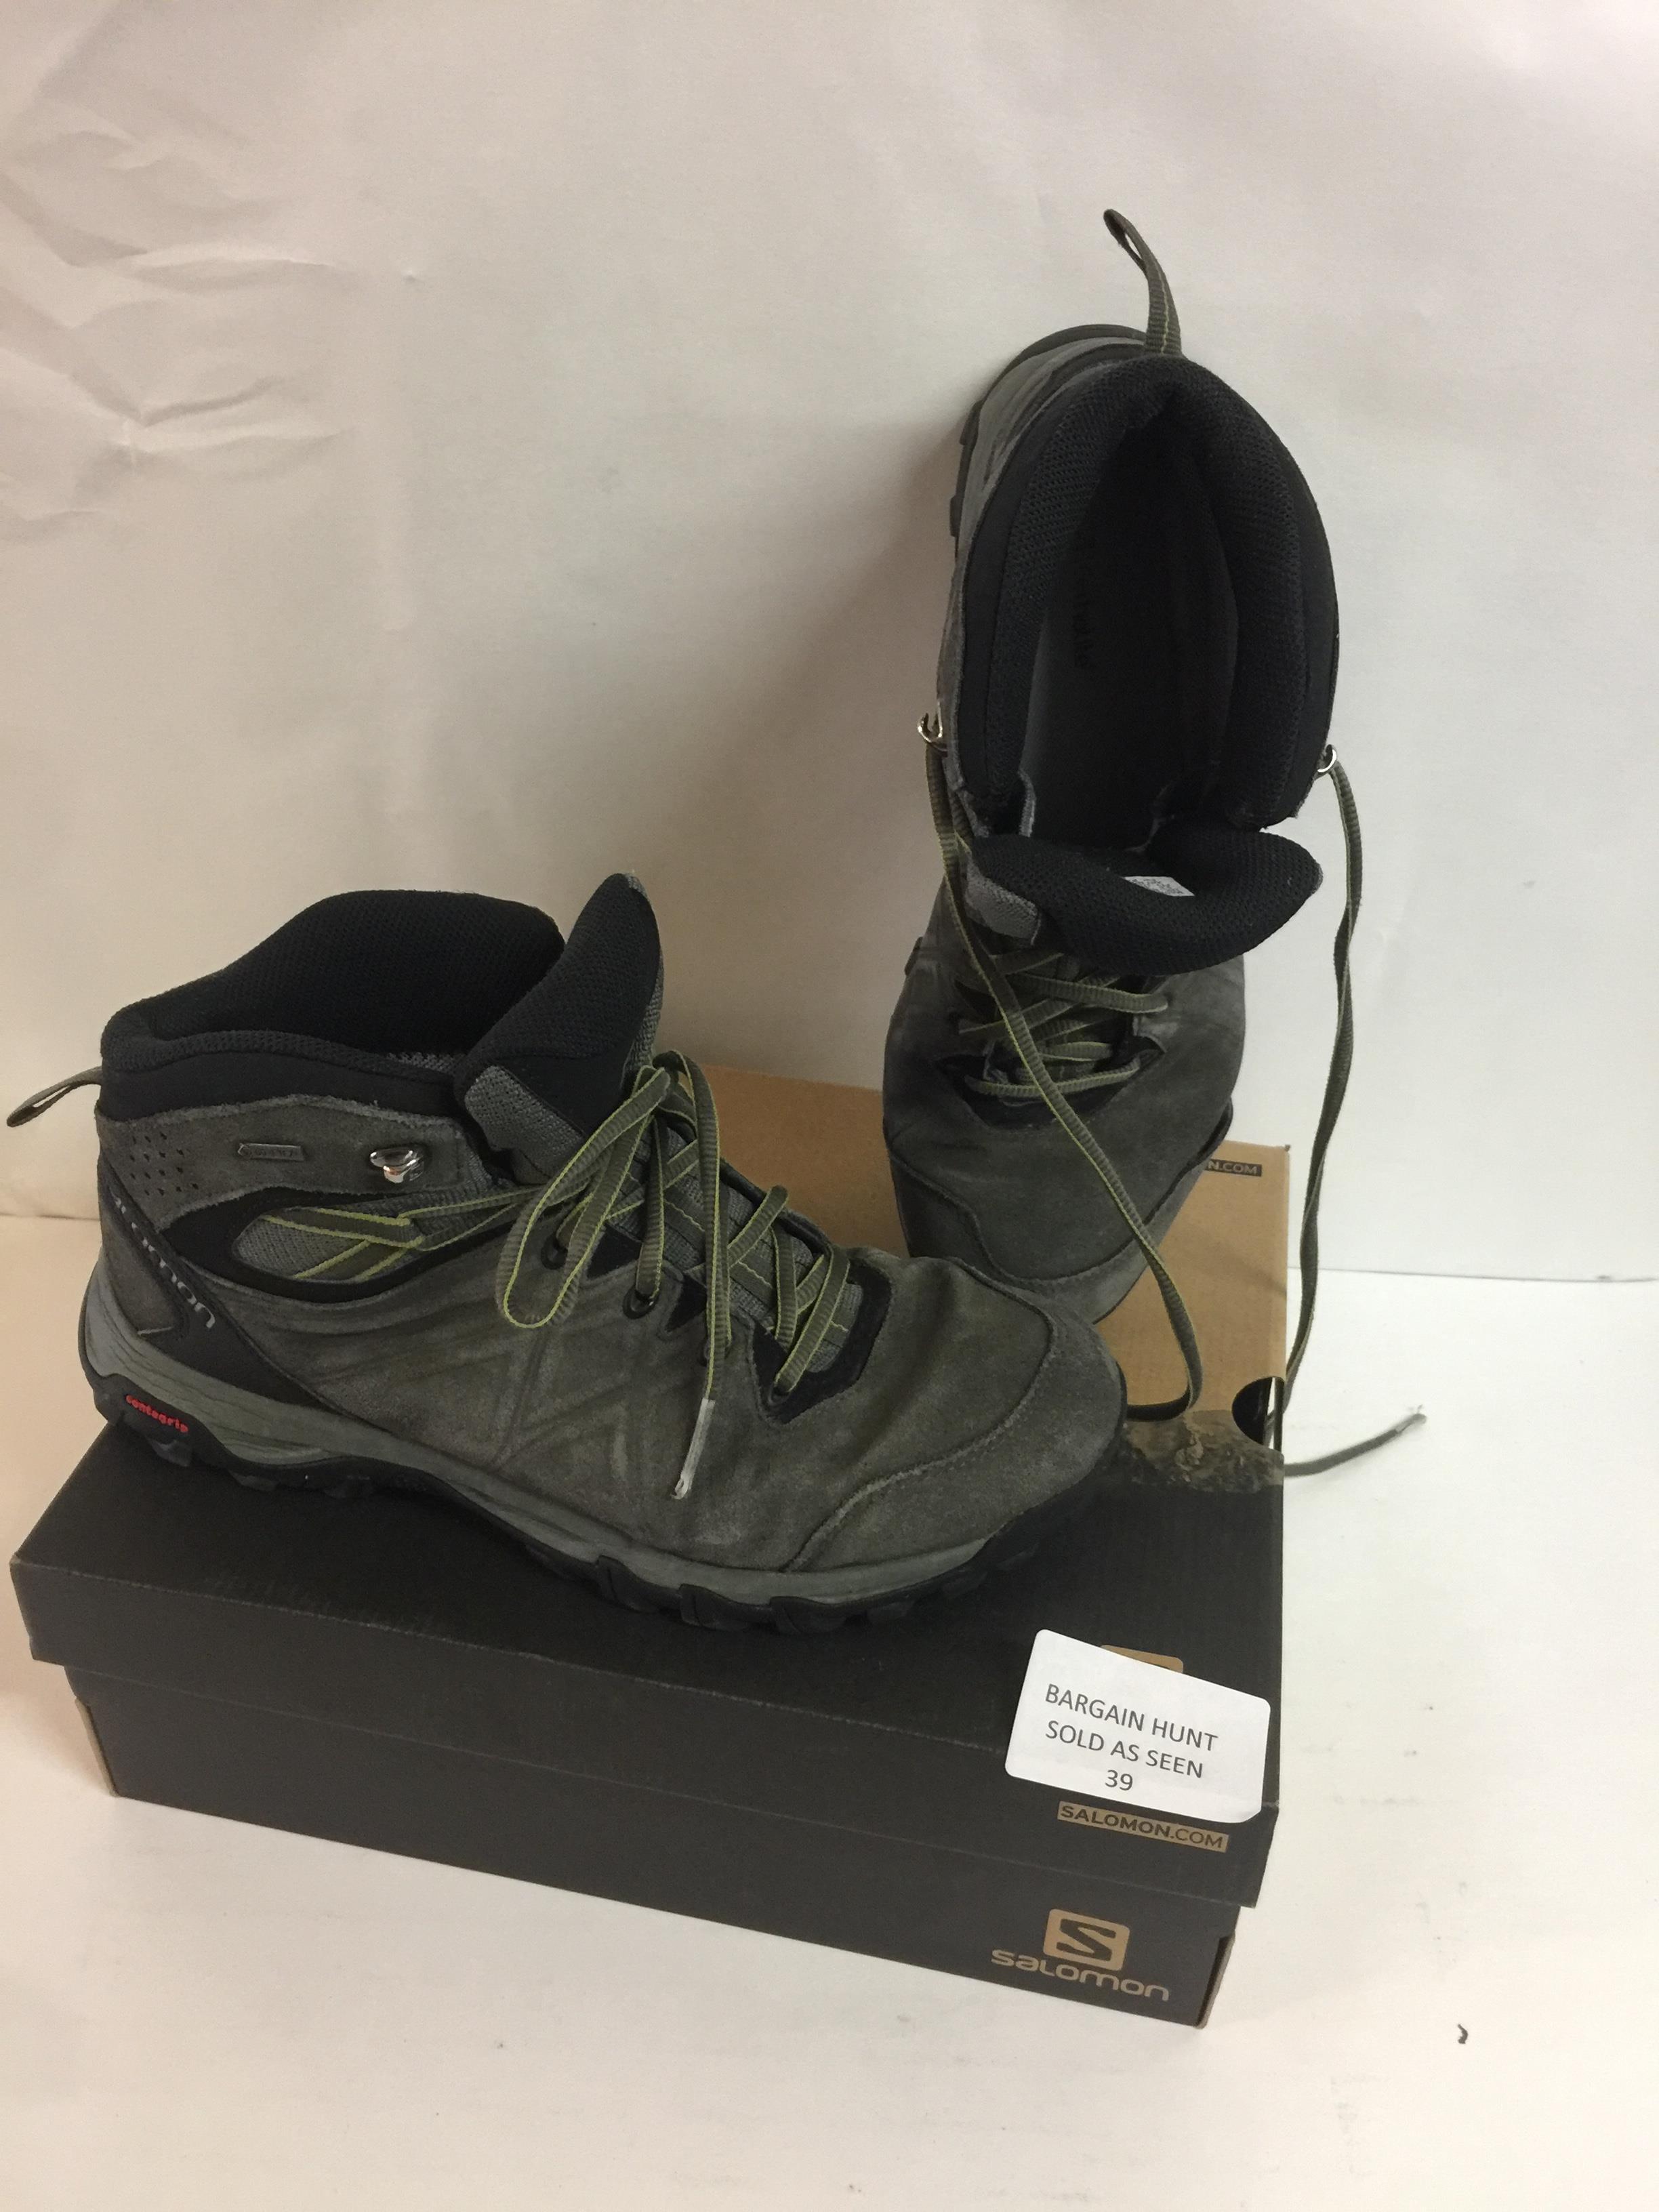 Lot 39 - Salomon Men's EVASION 2 MID LTR GTX Hiking and Multisport Shoes, 9.5 UK RRP £100